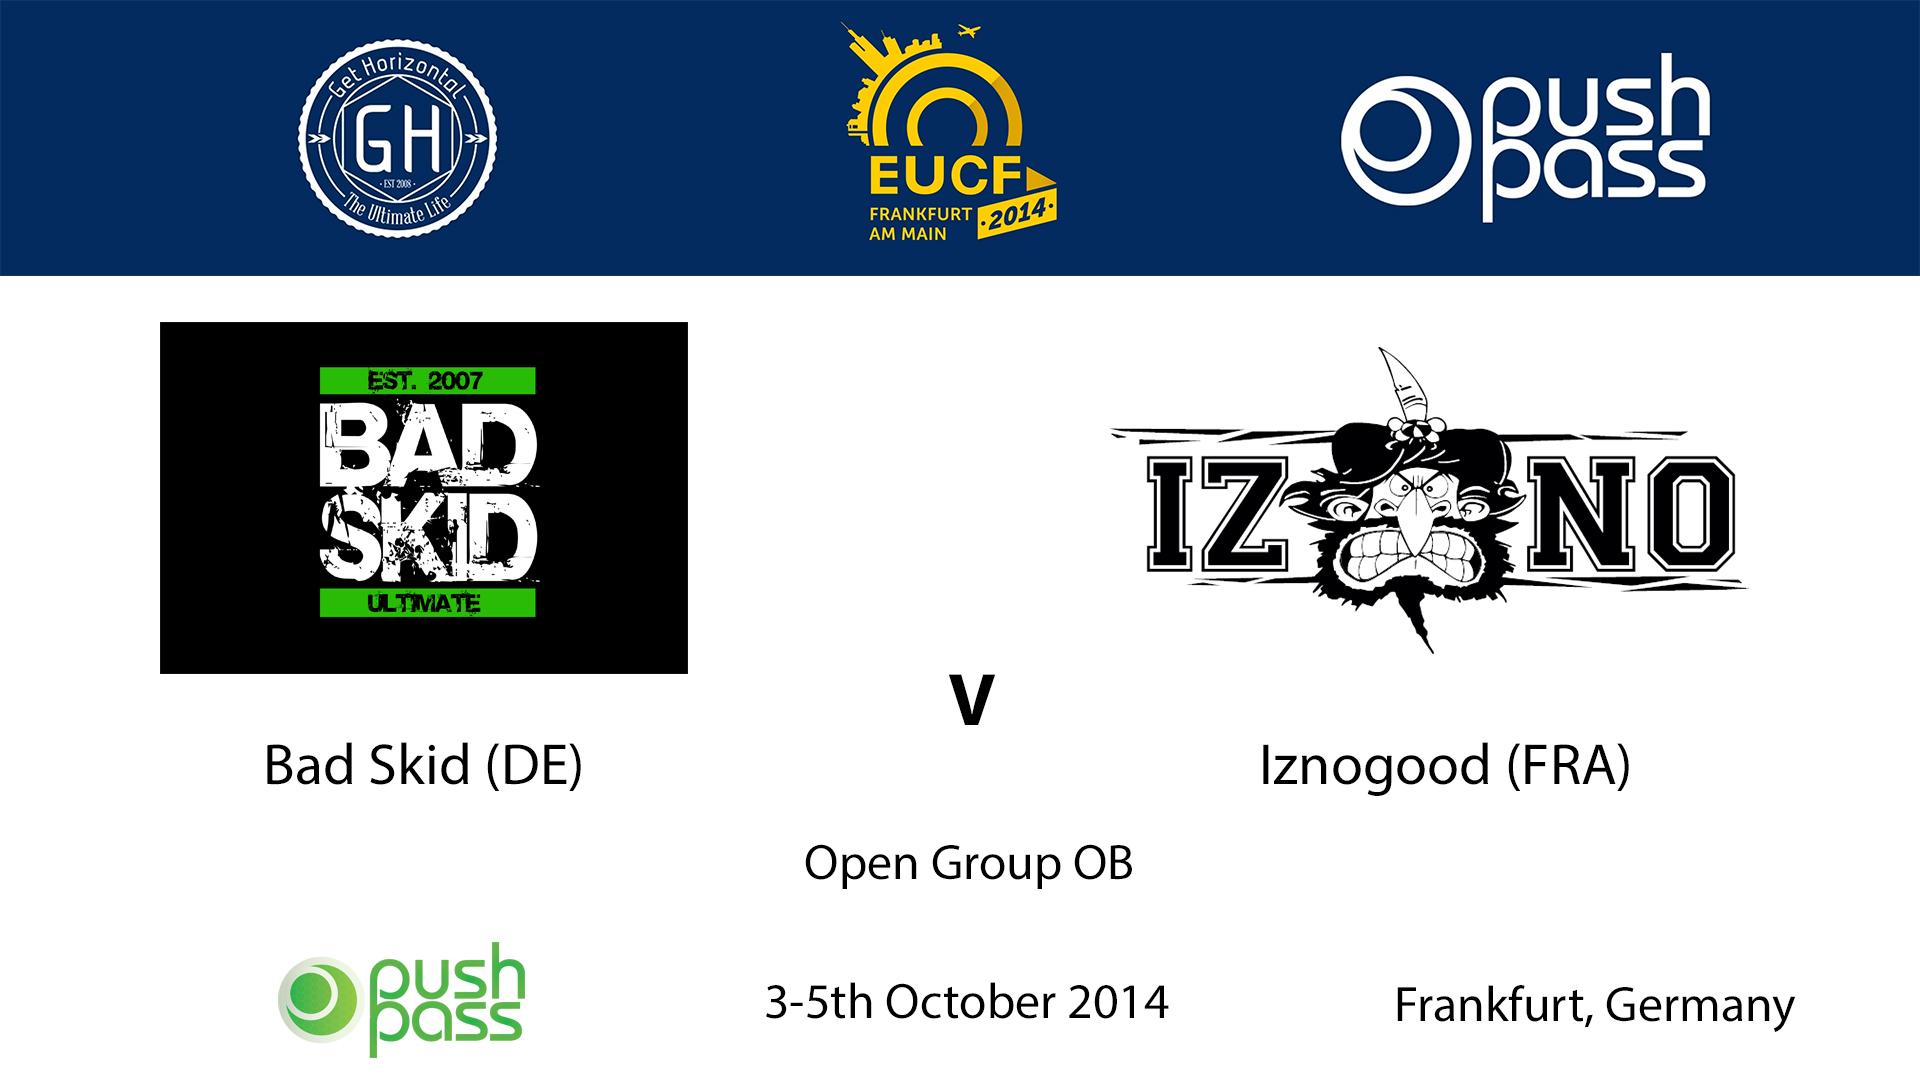 EUCF 2014: OB - Bad Skid v Iznogood